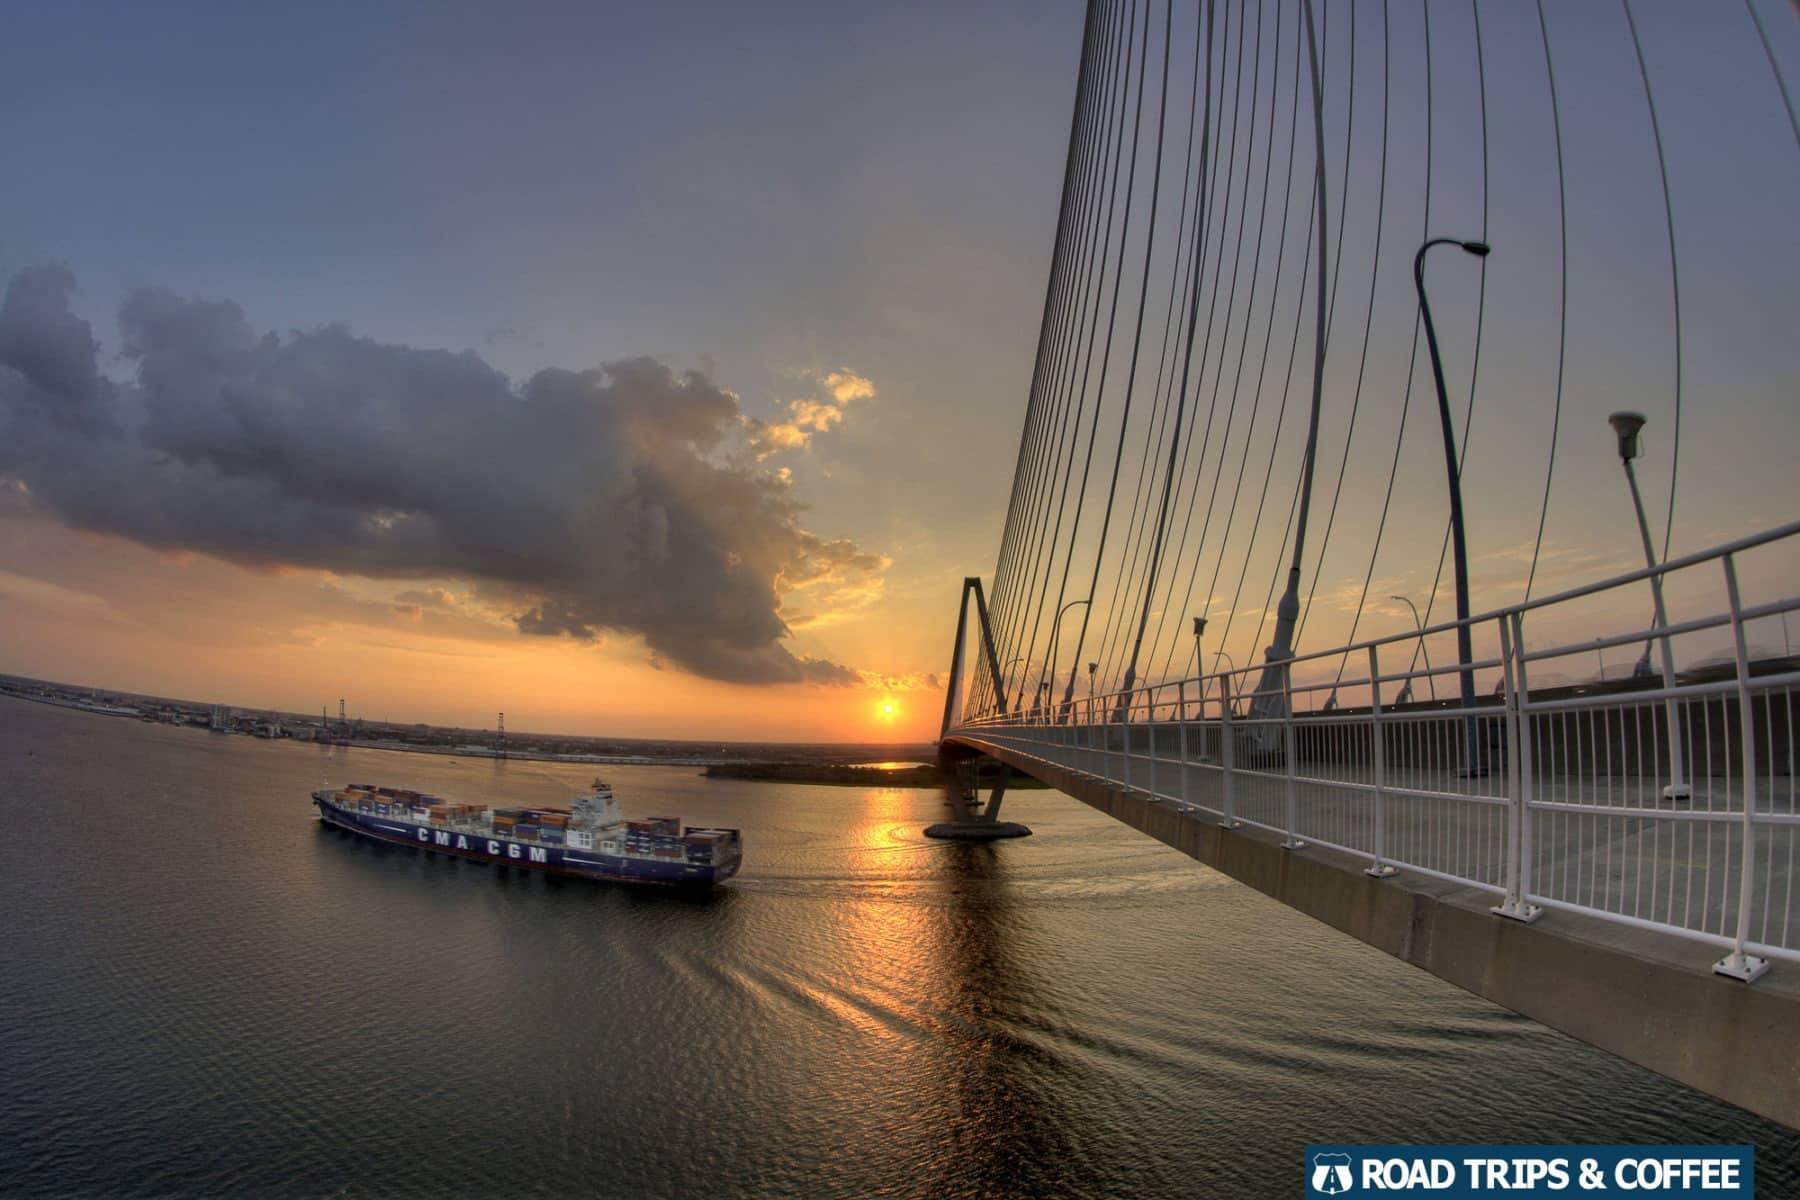 A large cargo ship cruises on the river during sunset beneath the long Arthur Ravenel Junior Bridge in Charleston, South Carolina